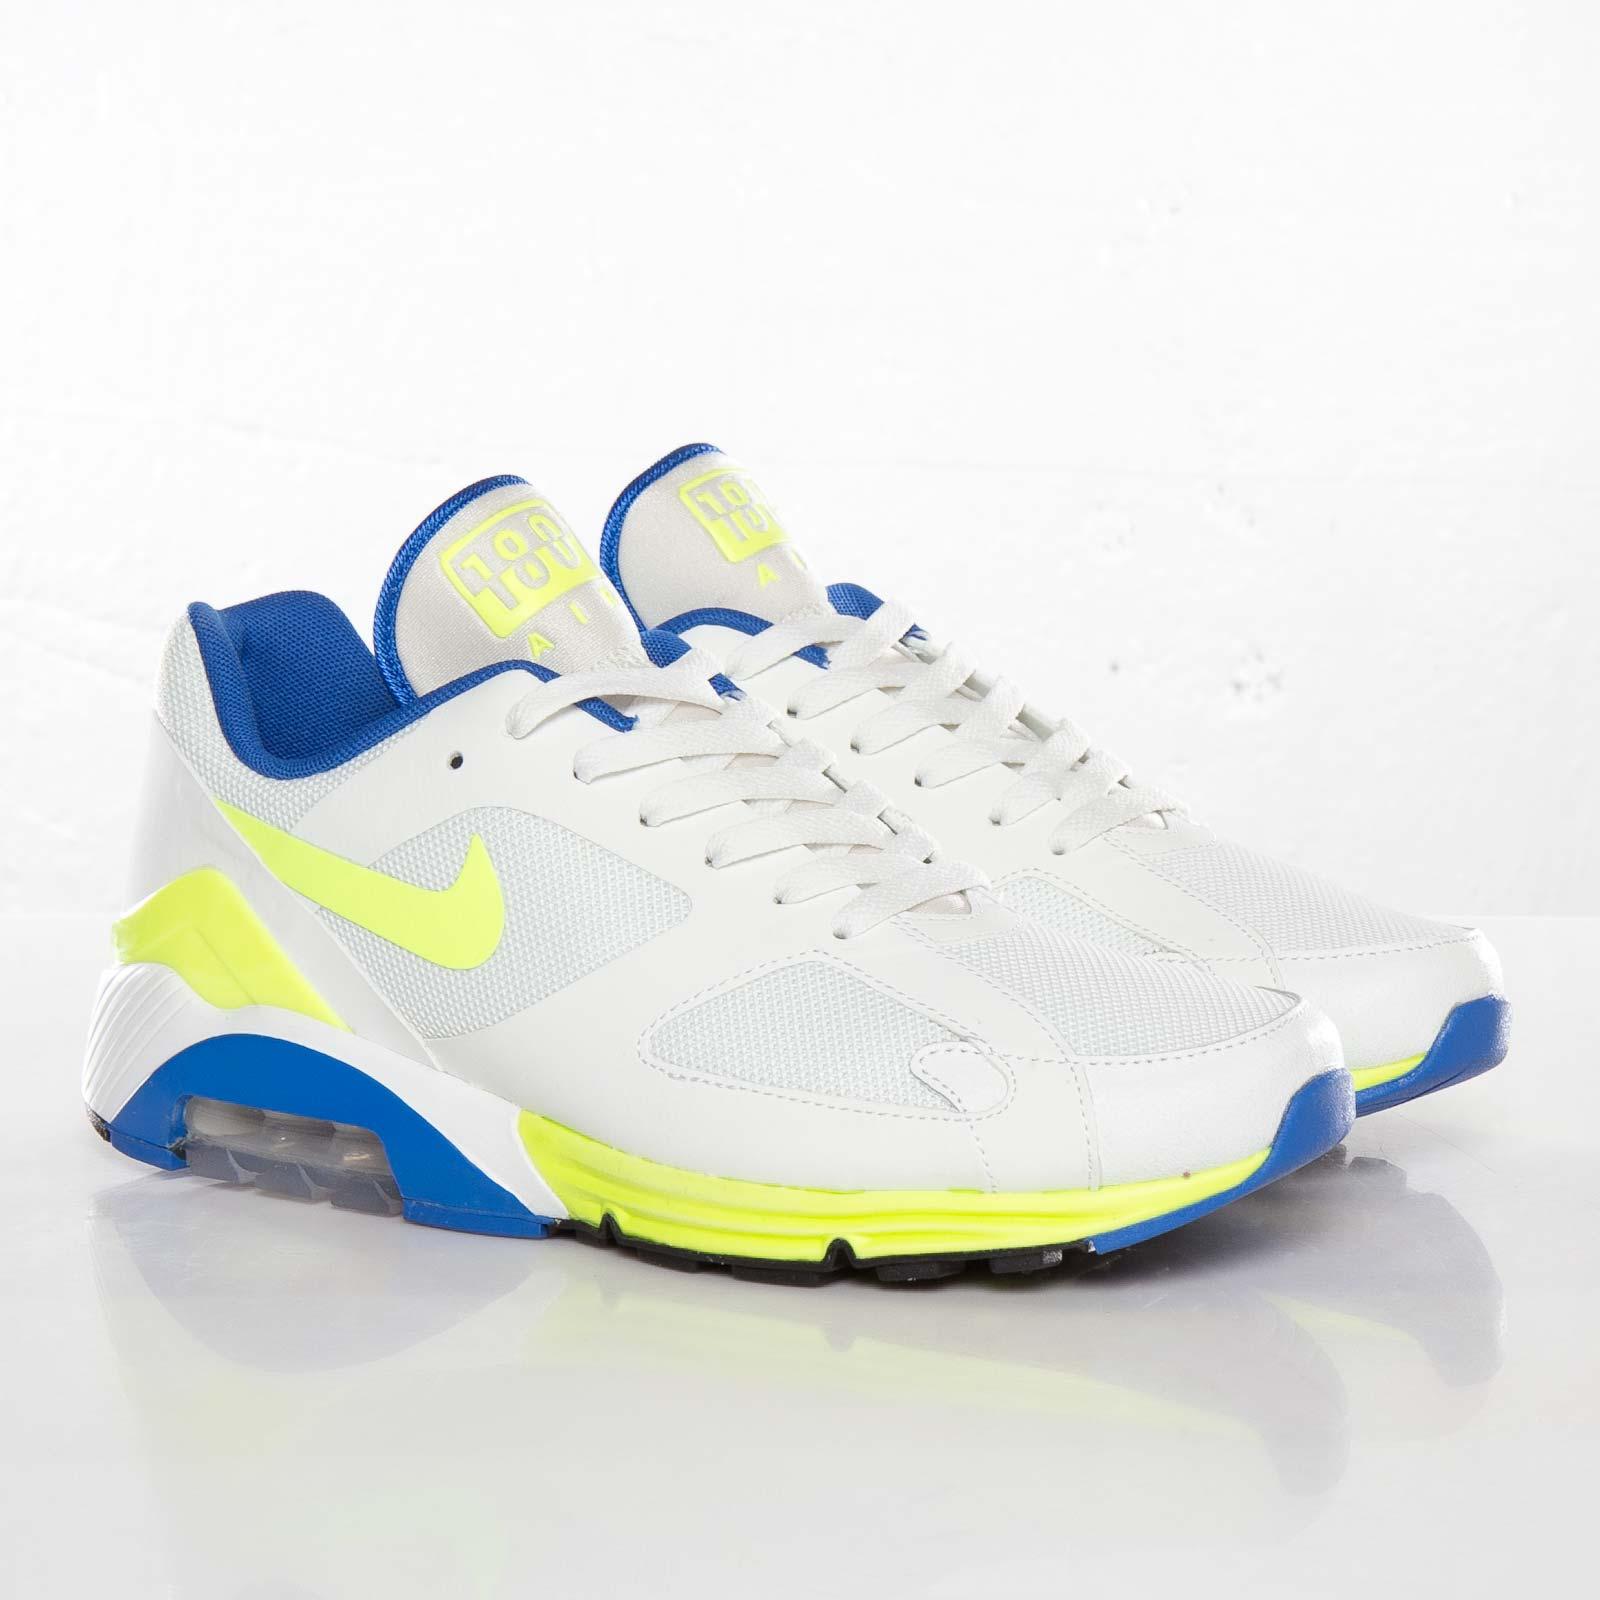 626500 180 Max 134 sneakers QS Terra Nike Air Sneakersnstuff 6q1AxnXHHw